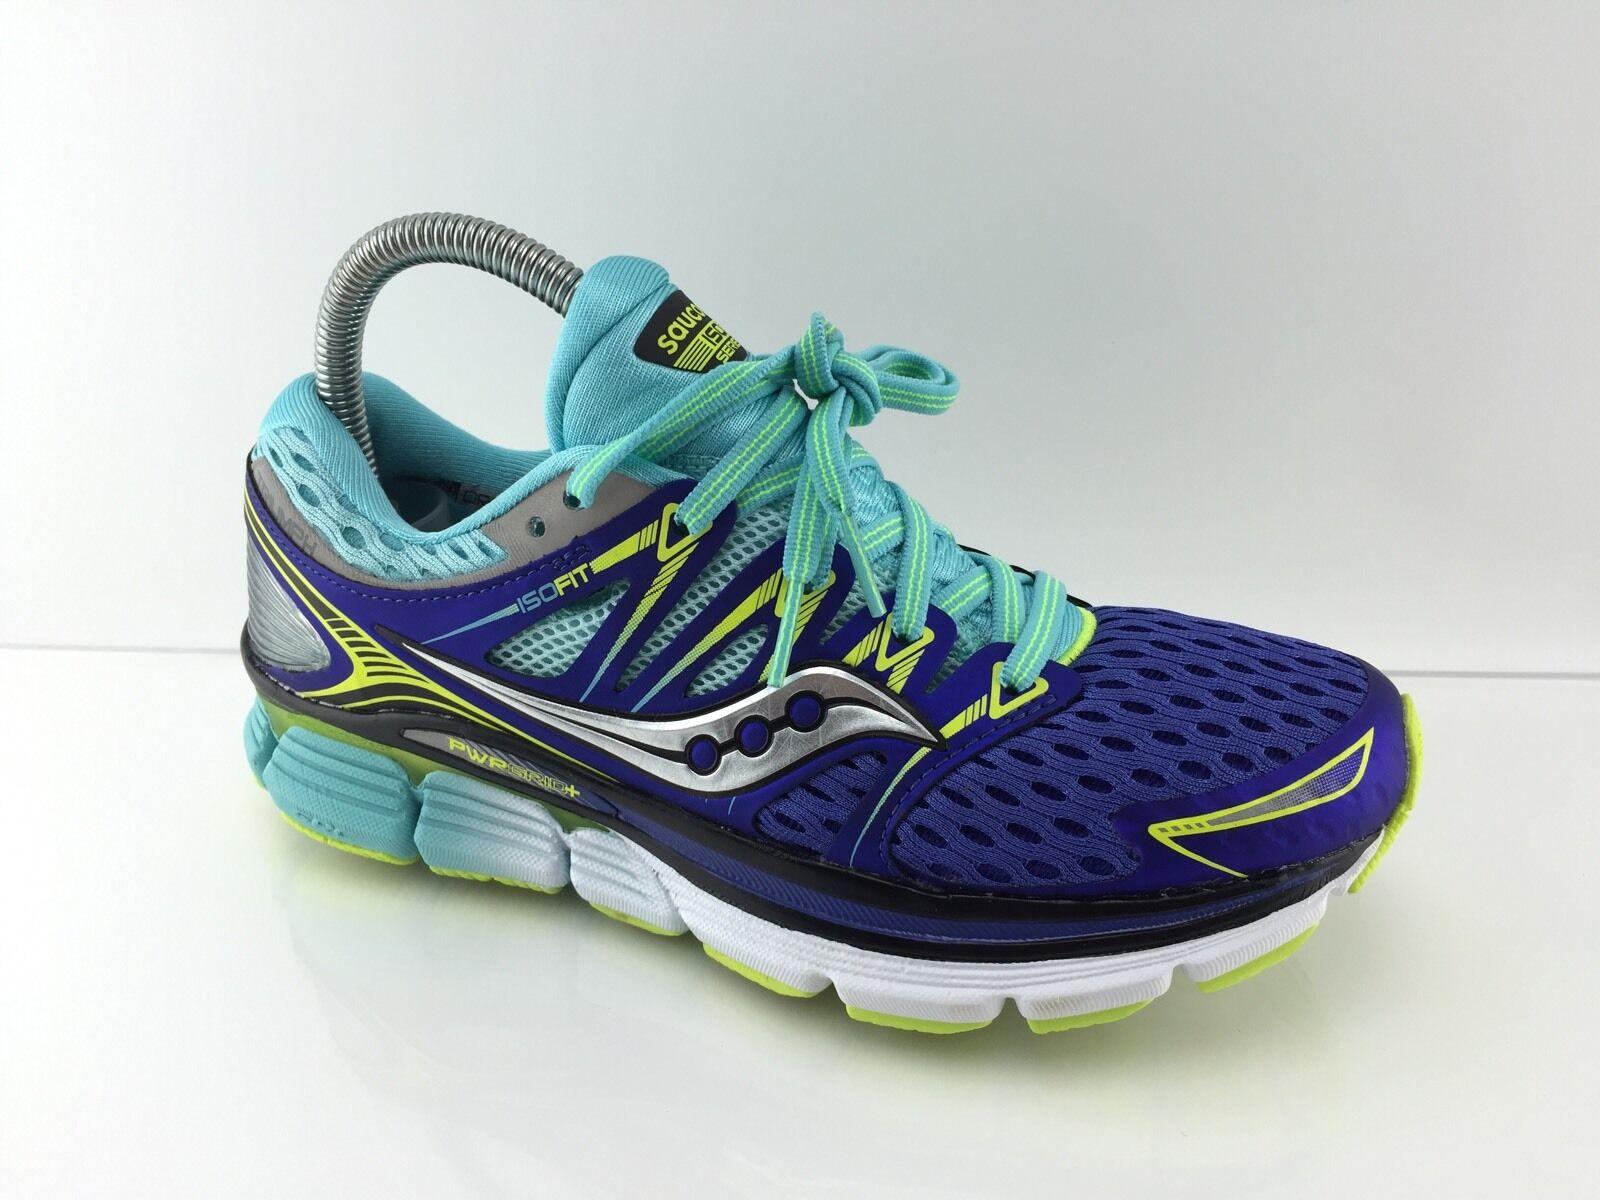 129 Saucony Triumph ISO Womens Dark Twilight multi color Athletic shoes 7